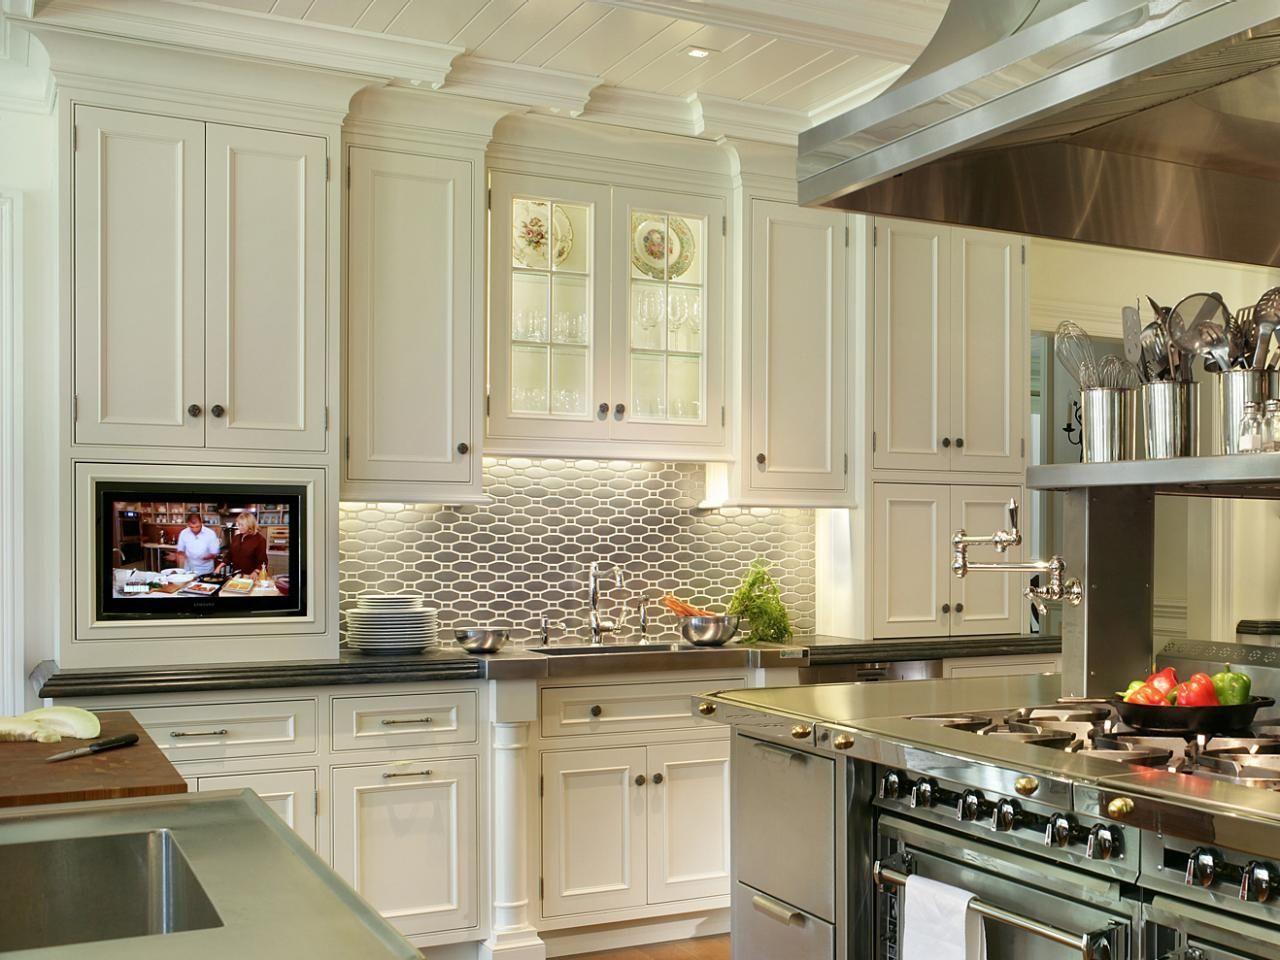 Tall Kitchen Wall Cabinet Doors   http://garecscleaningsystems.net ...